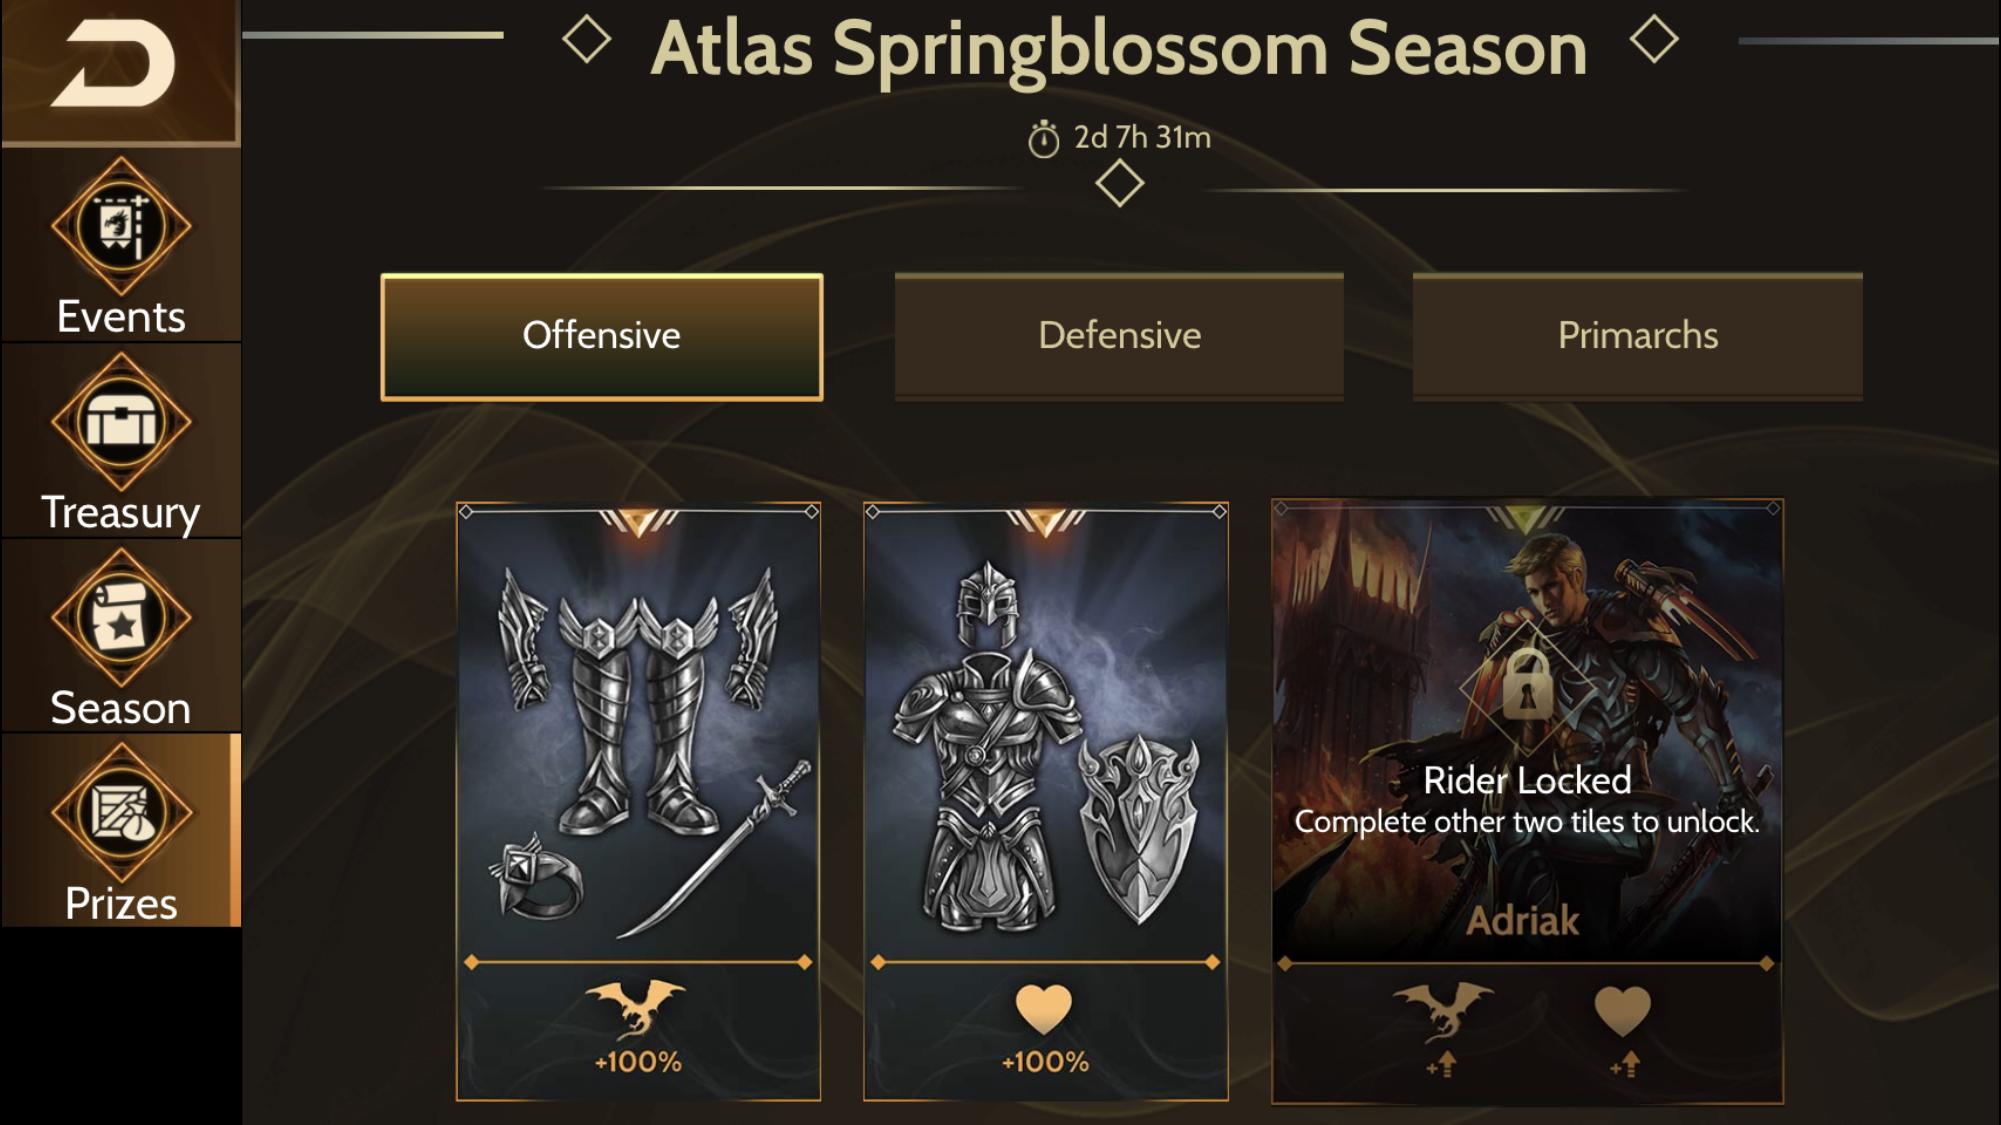 War Dragons - New Atlas Seasons Format, Adriak